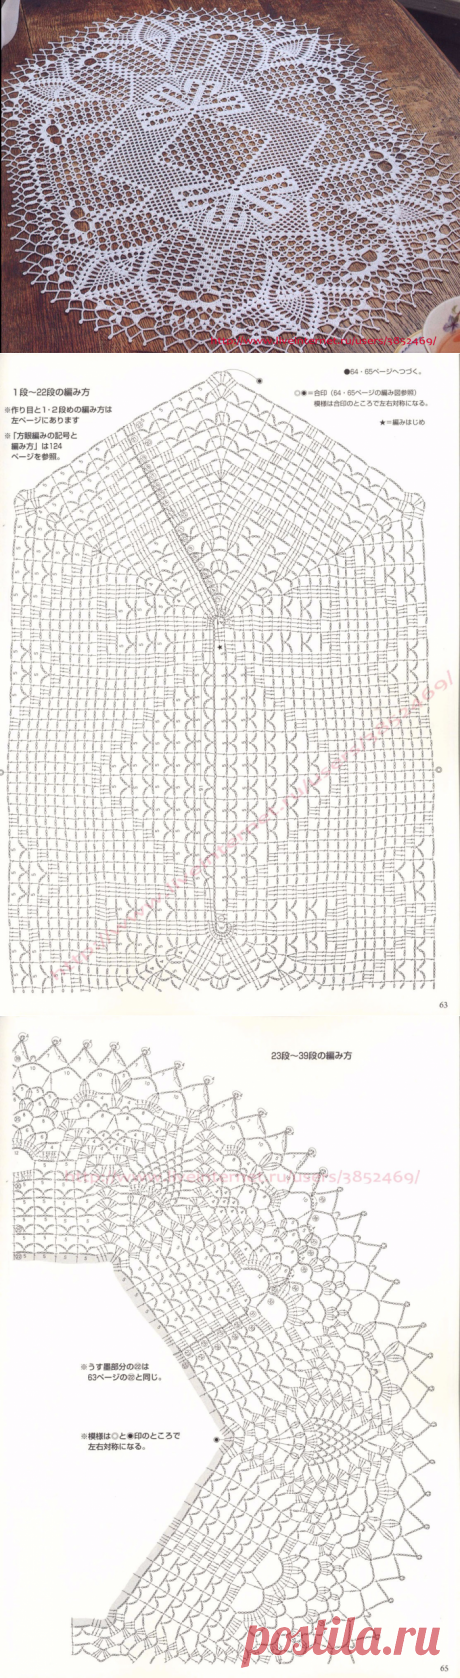 Овальная салфетка 40 см Х 55 см